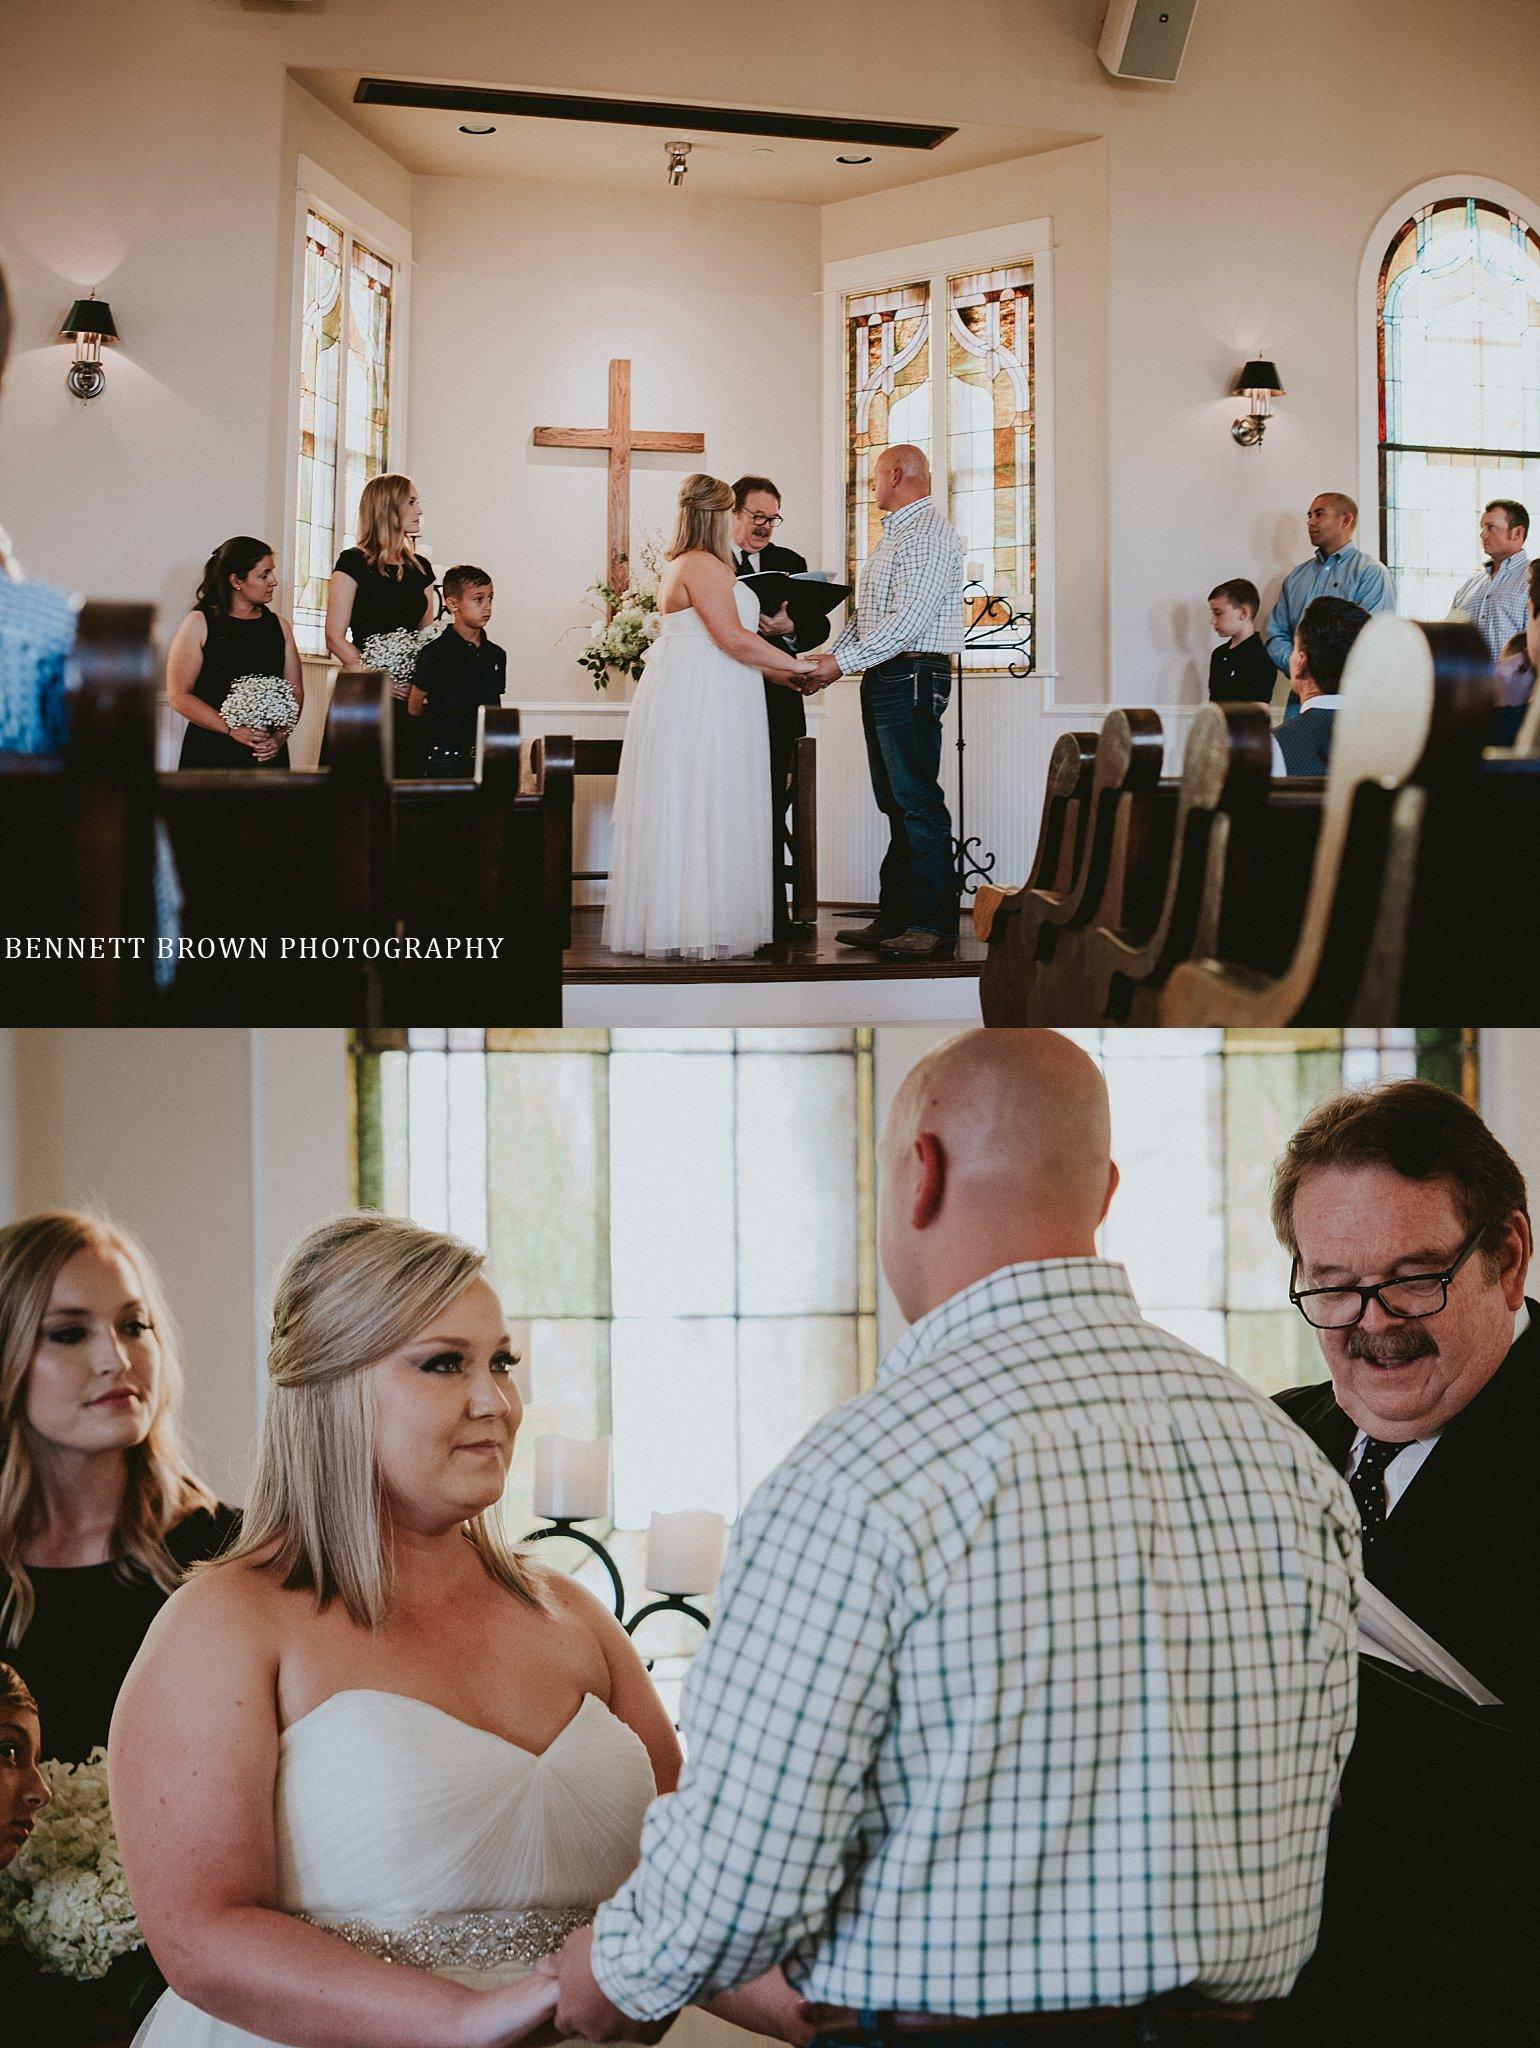 Bennett Brown Photography Frisco Texas Wedding chapel church bride groom wedding party